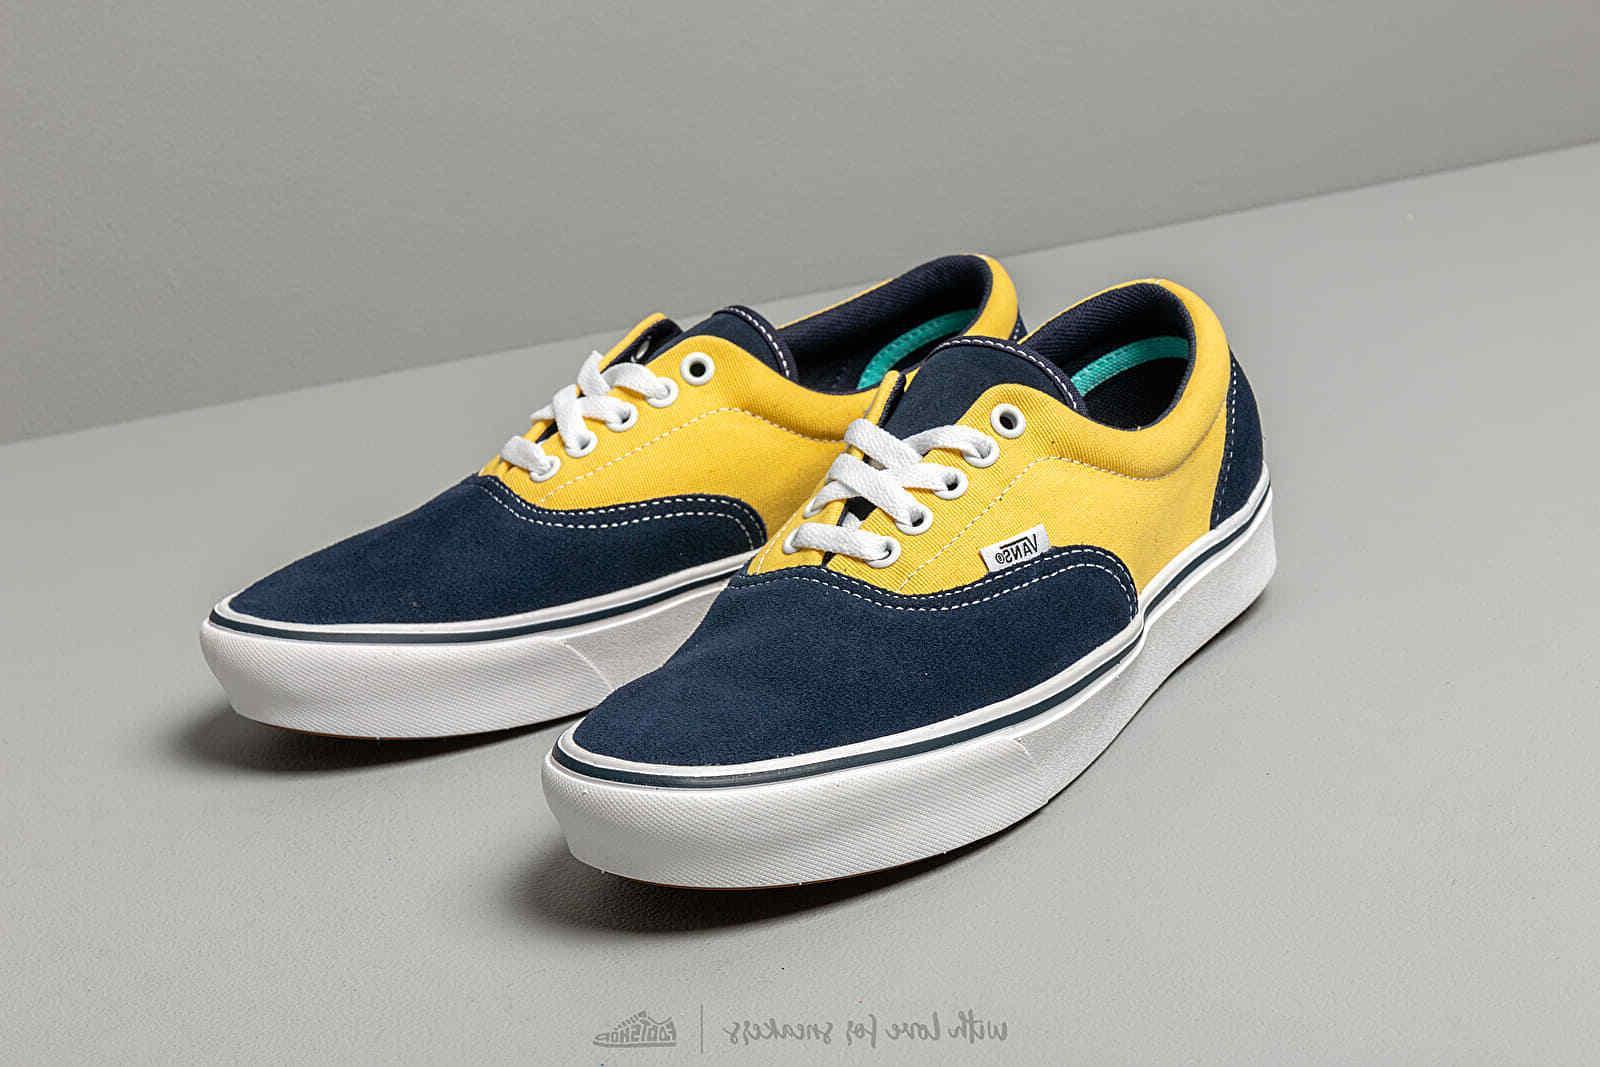 Vans Dress Blue Men's Skate Shoes